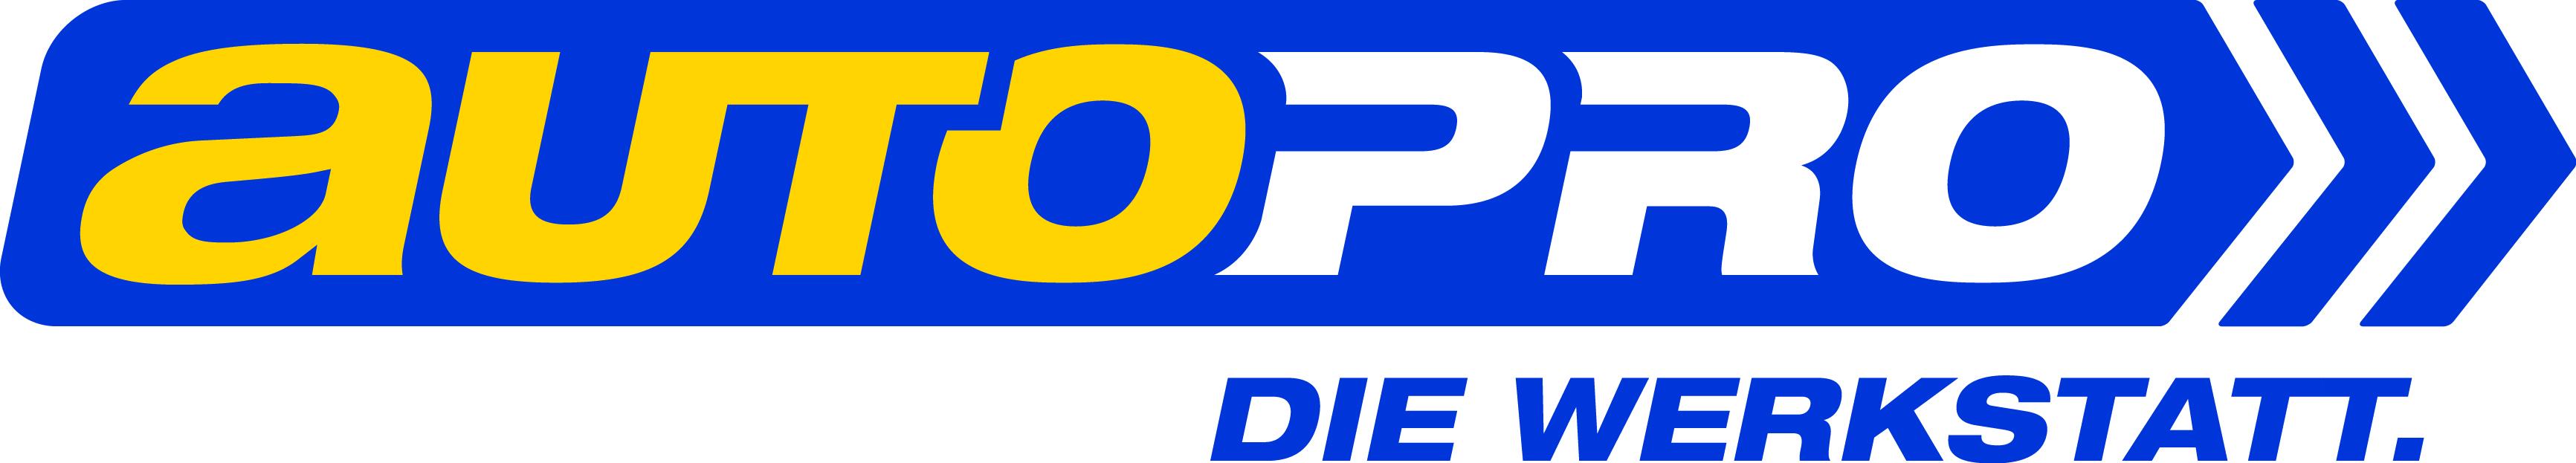 Autopro Meisterbetrieb Ingo Gude logo